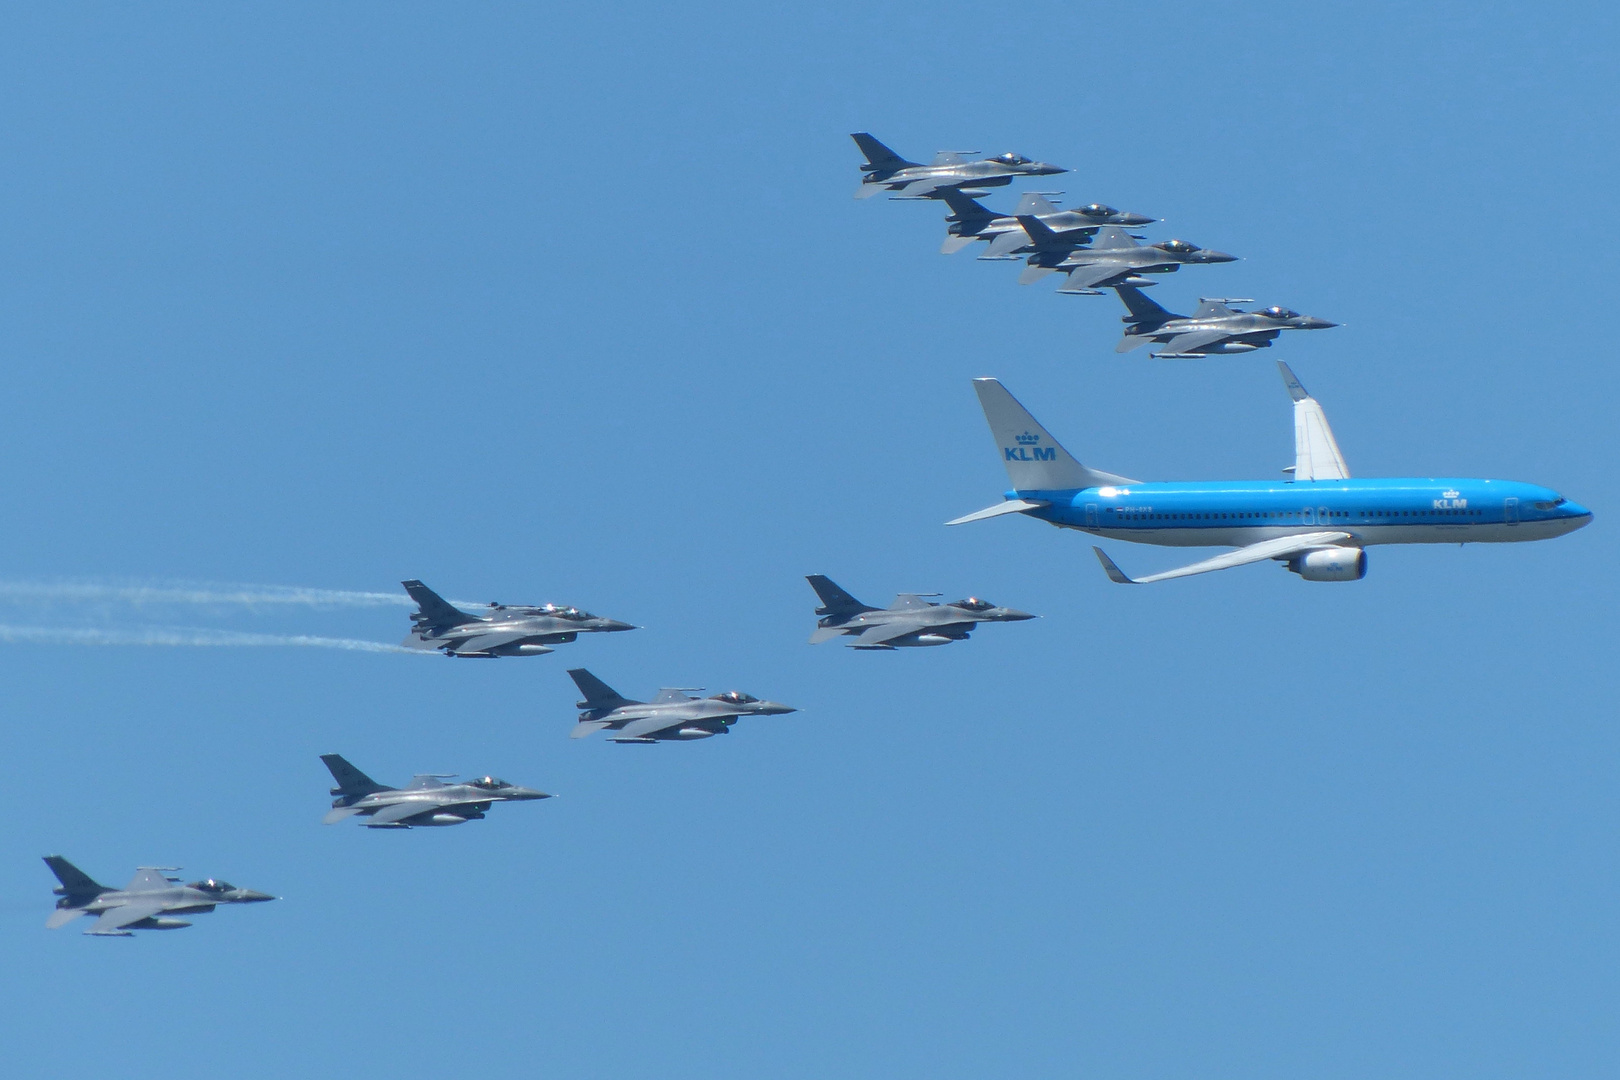 KLM + 10 F-16